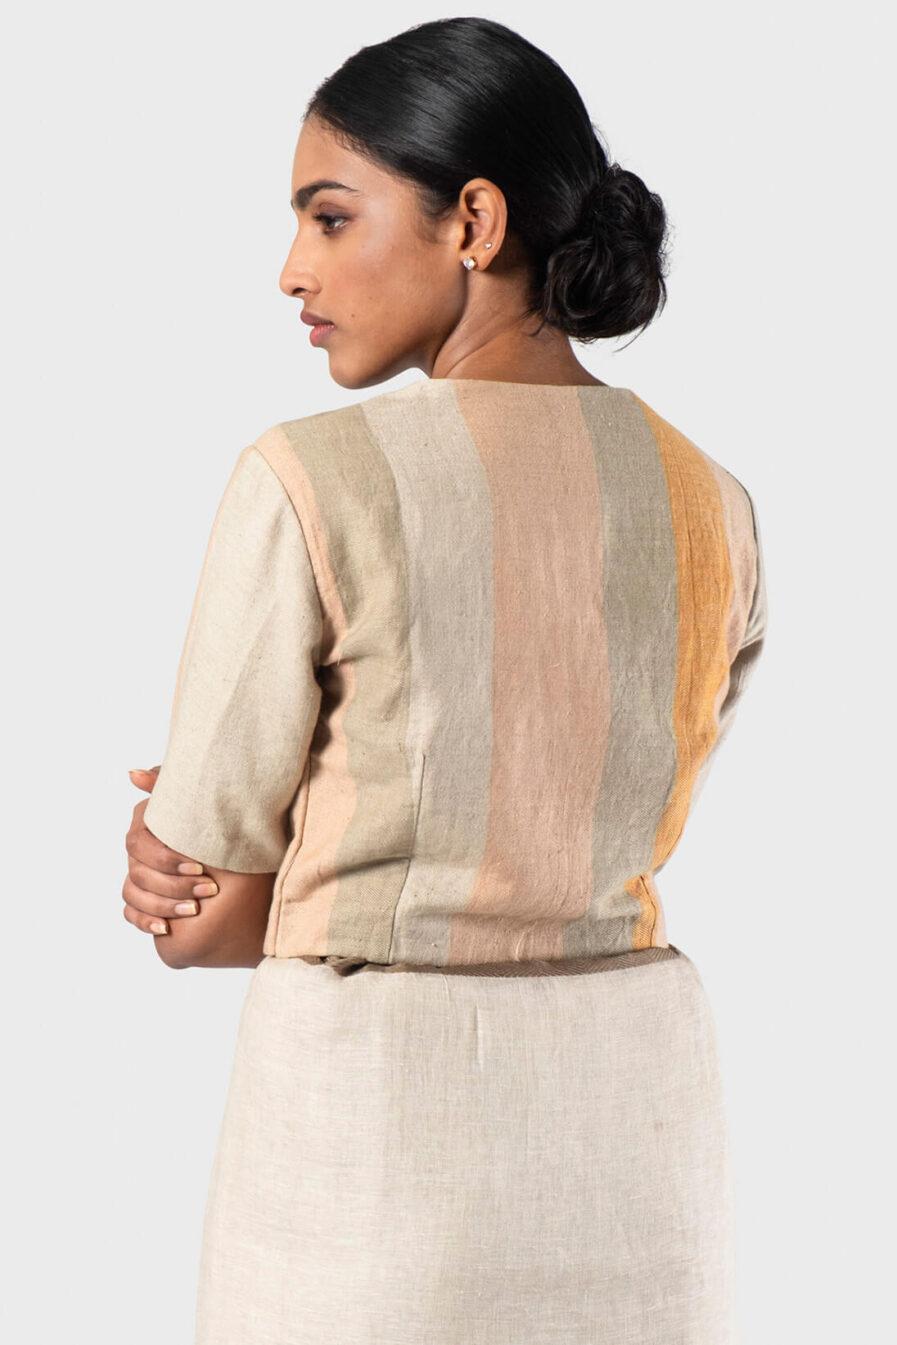 Anavila Peach Linen stripes blouse